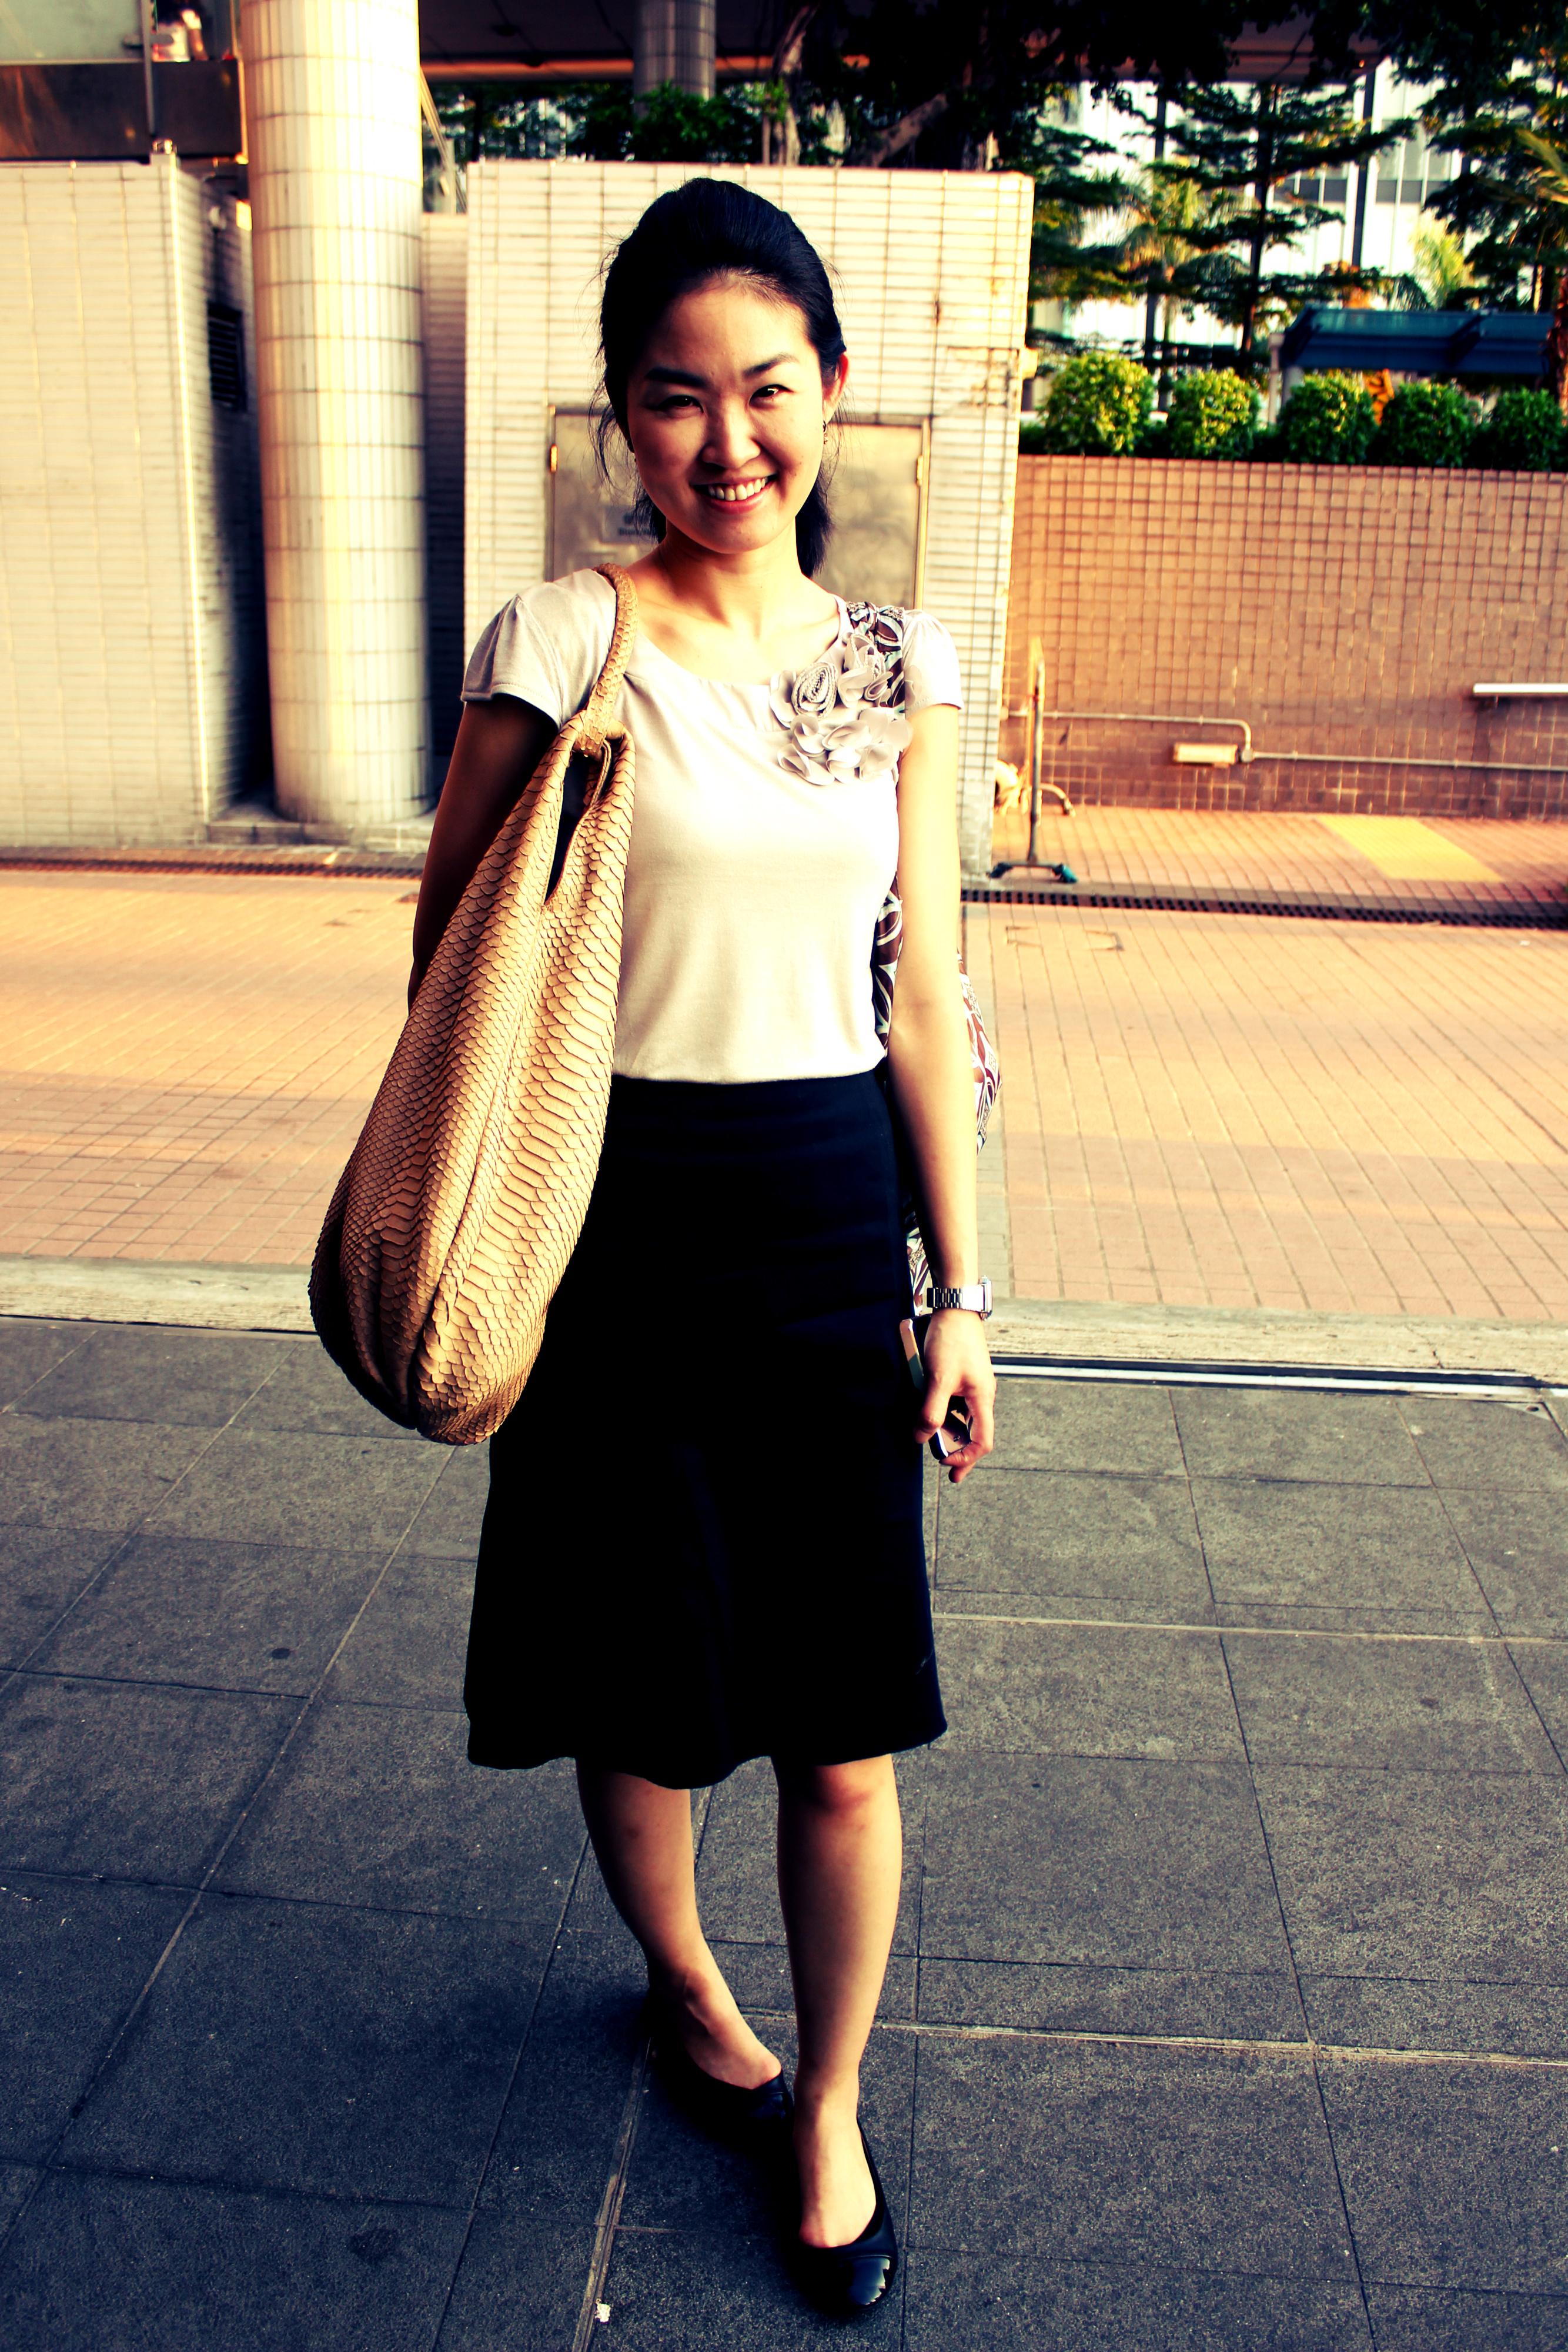 https://fashioninhkdotcom.files.wordpress.com/2012/05/ol5.jpg